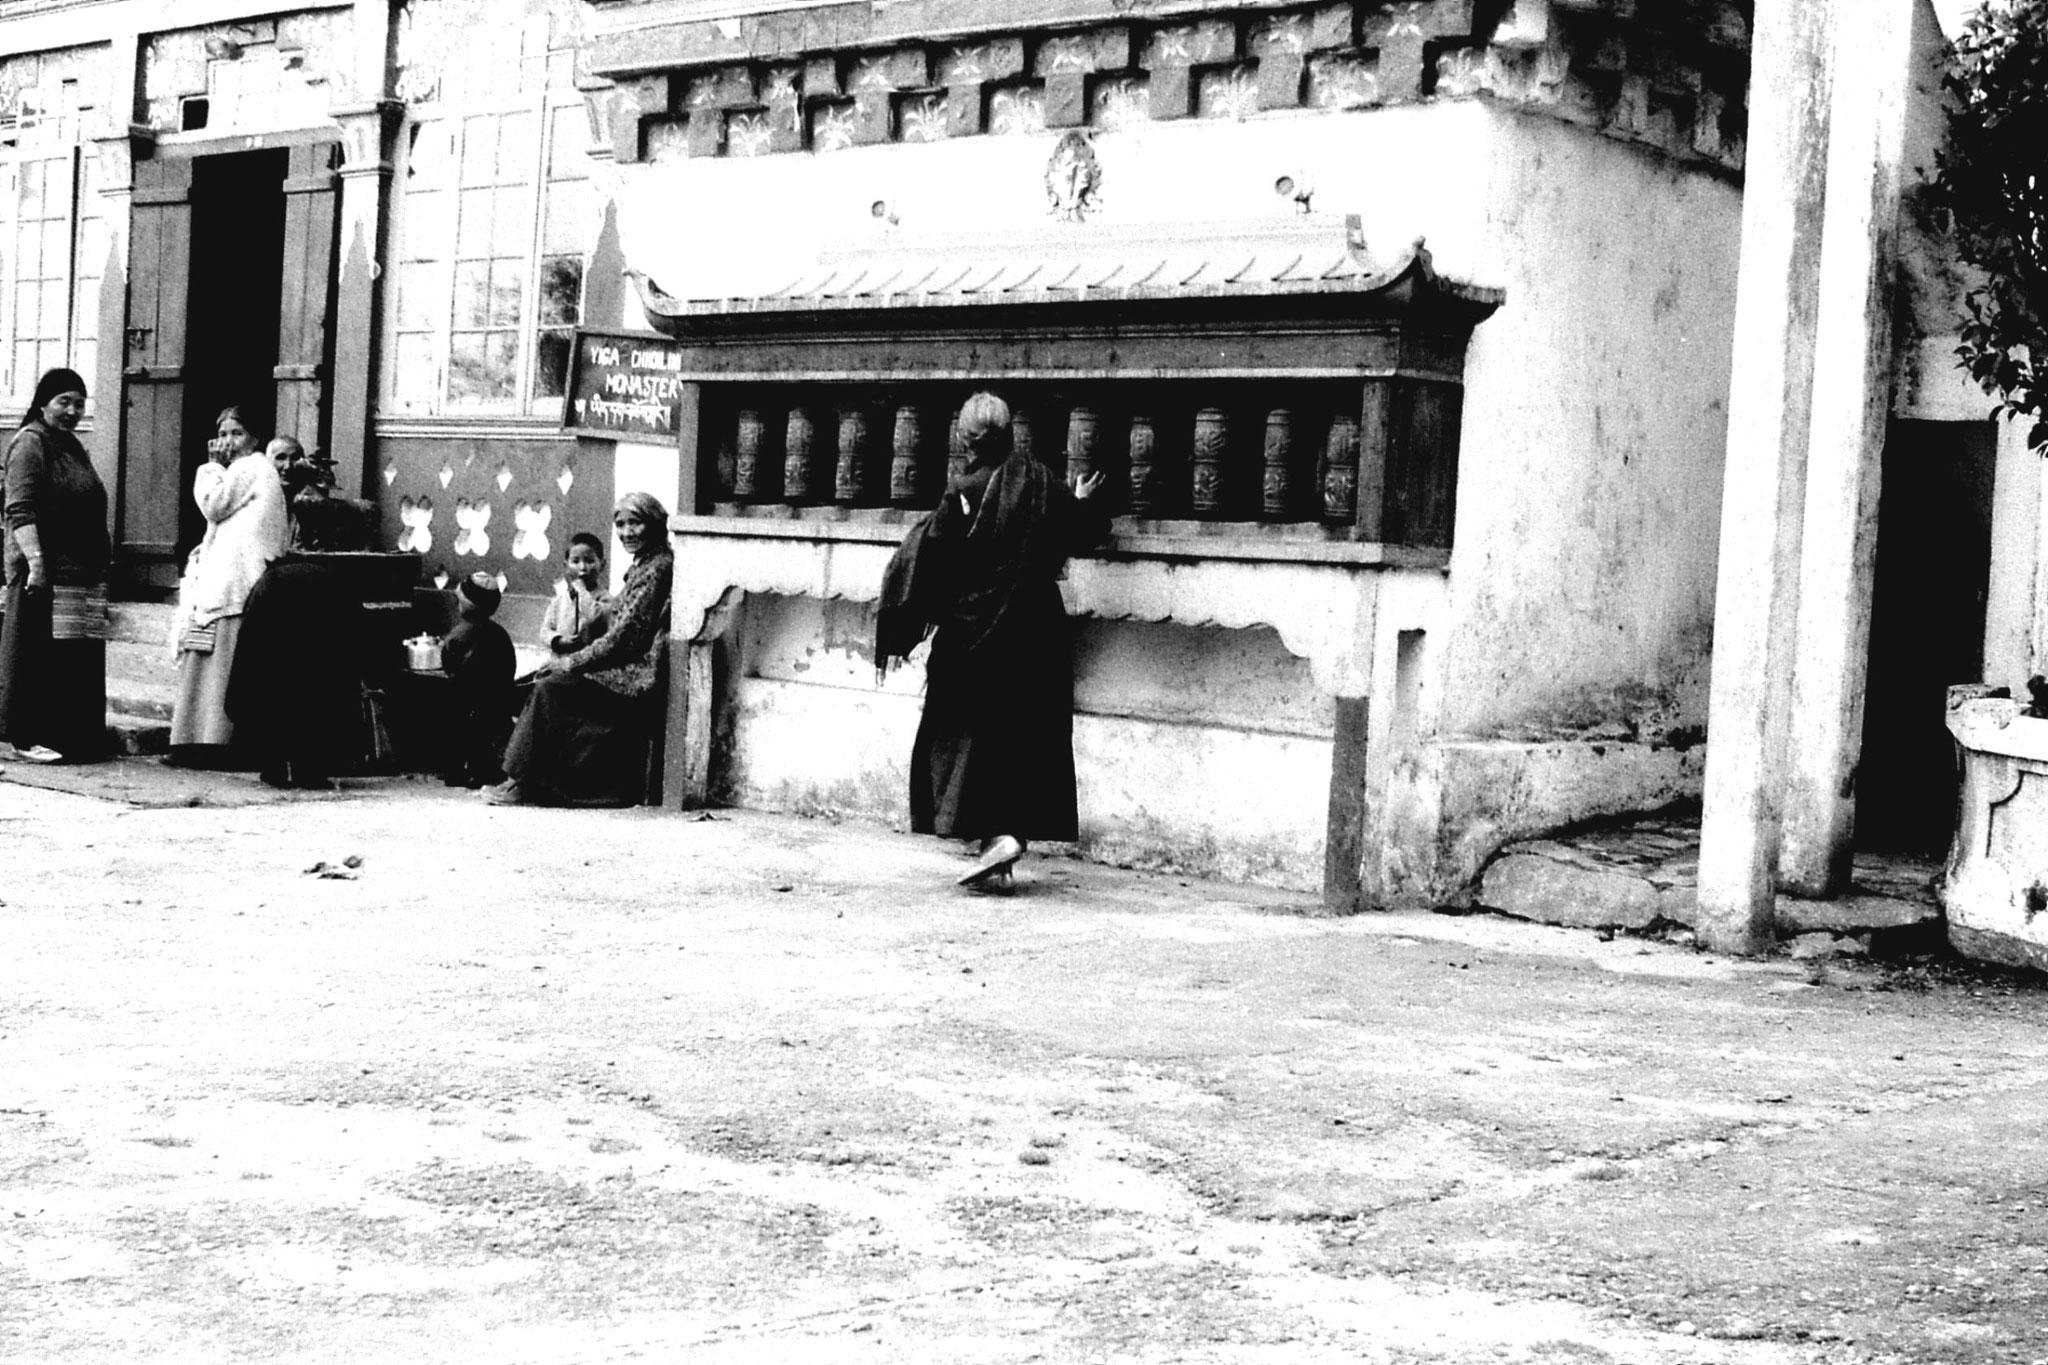 9/5/1990: 4: Ghoon monastery